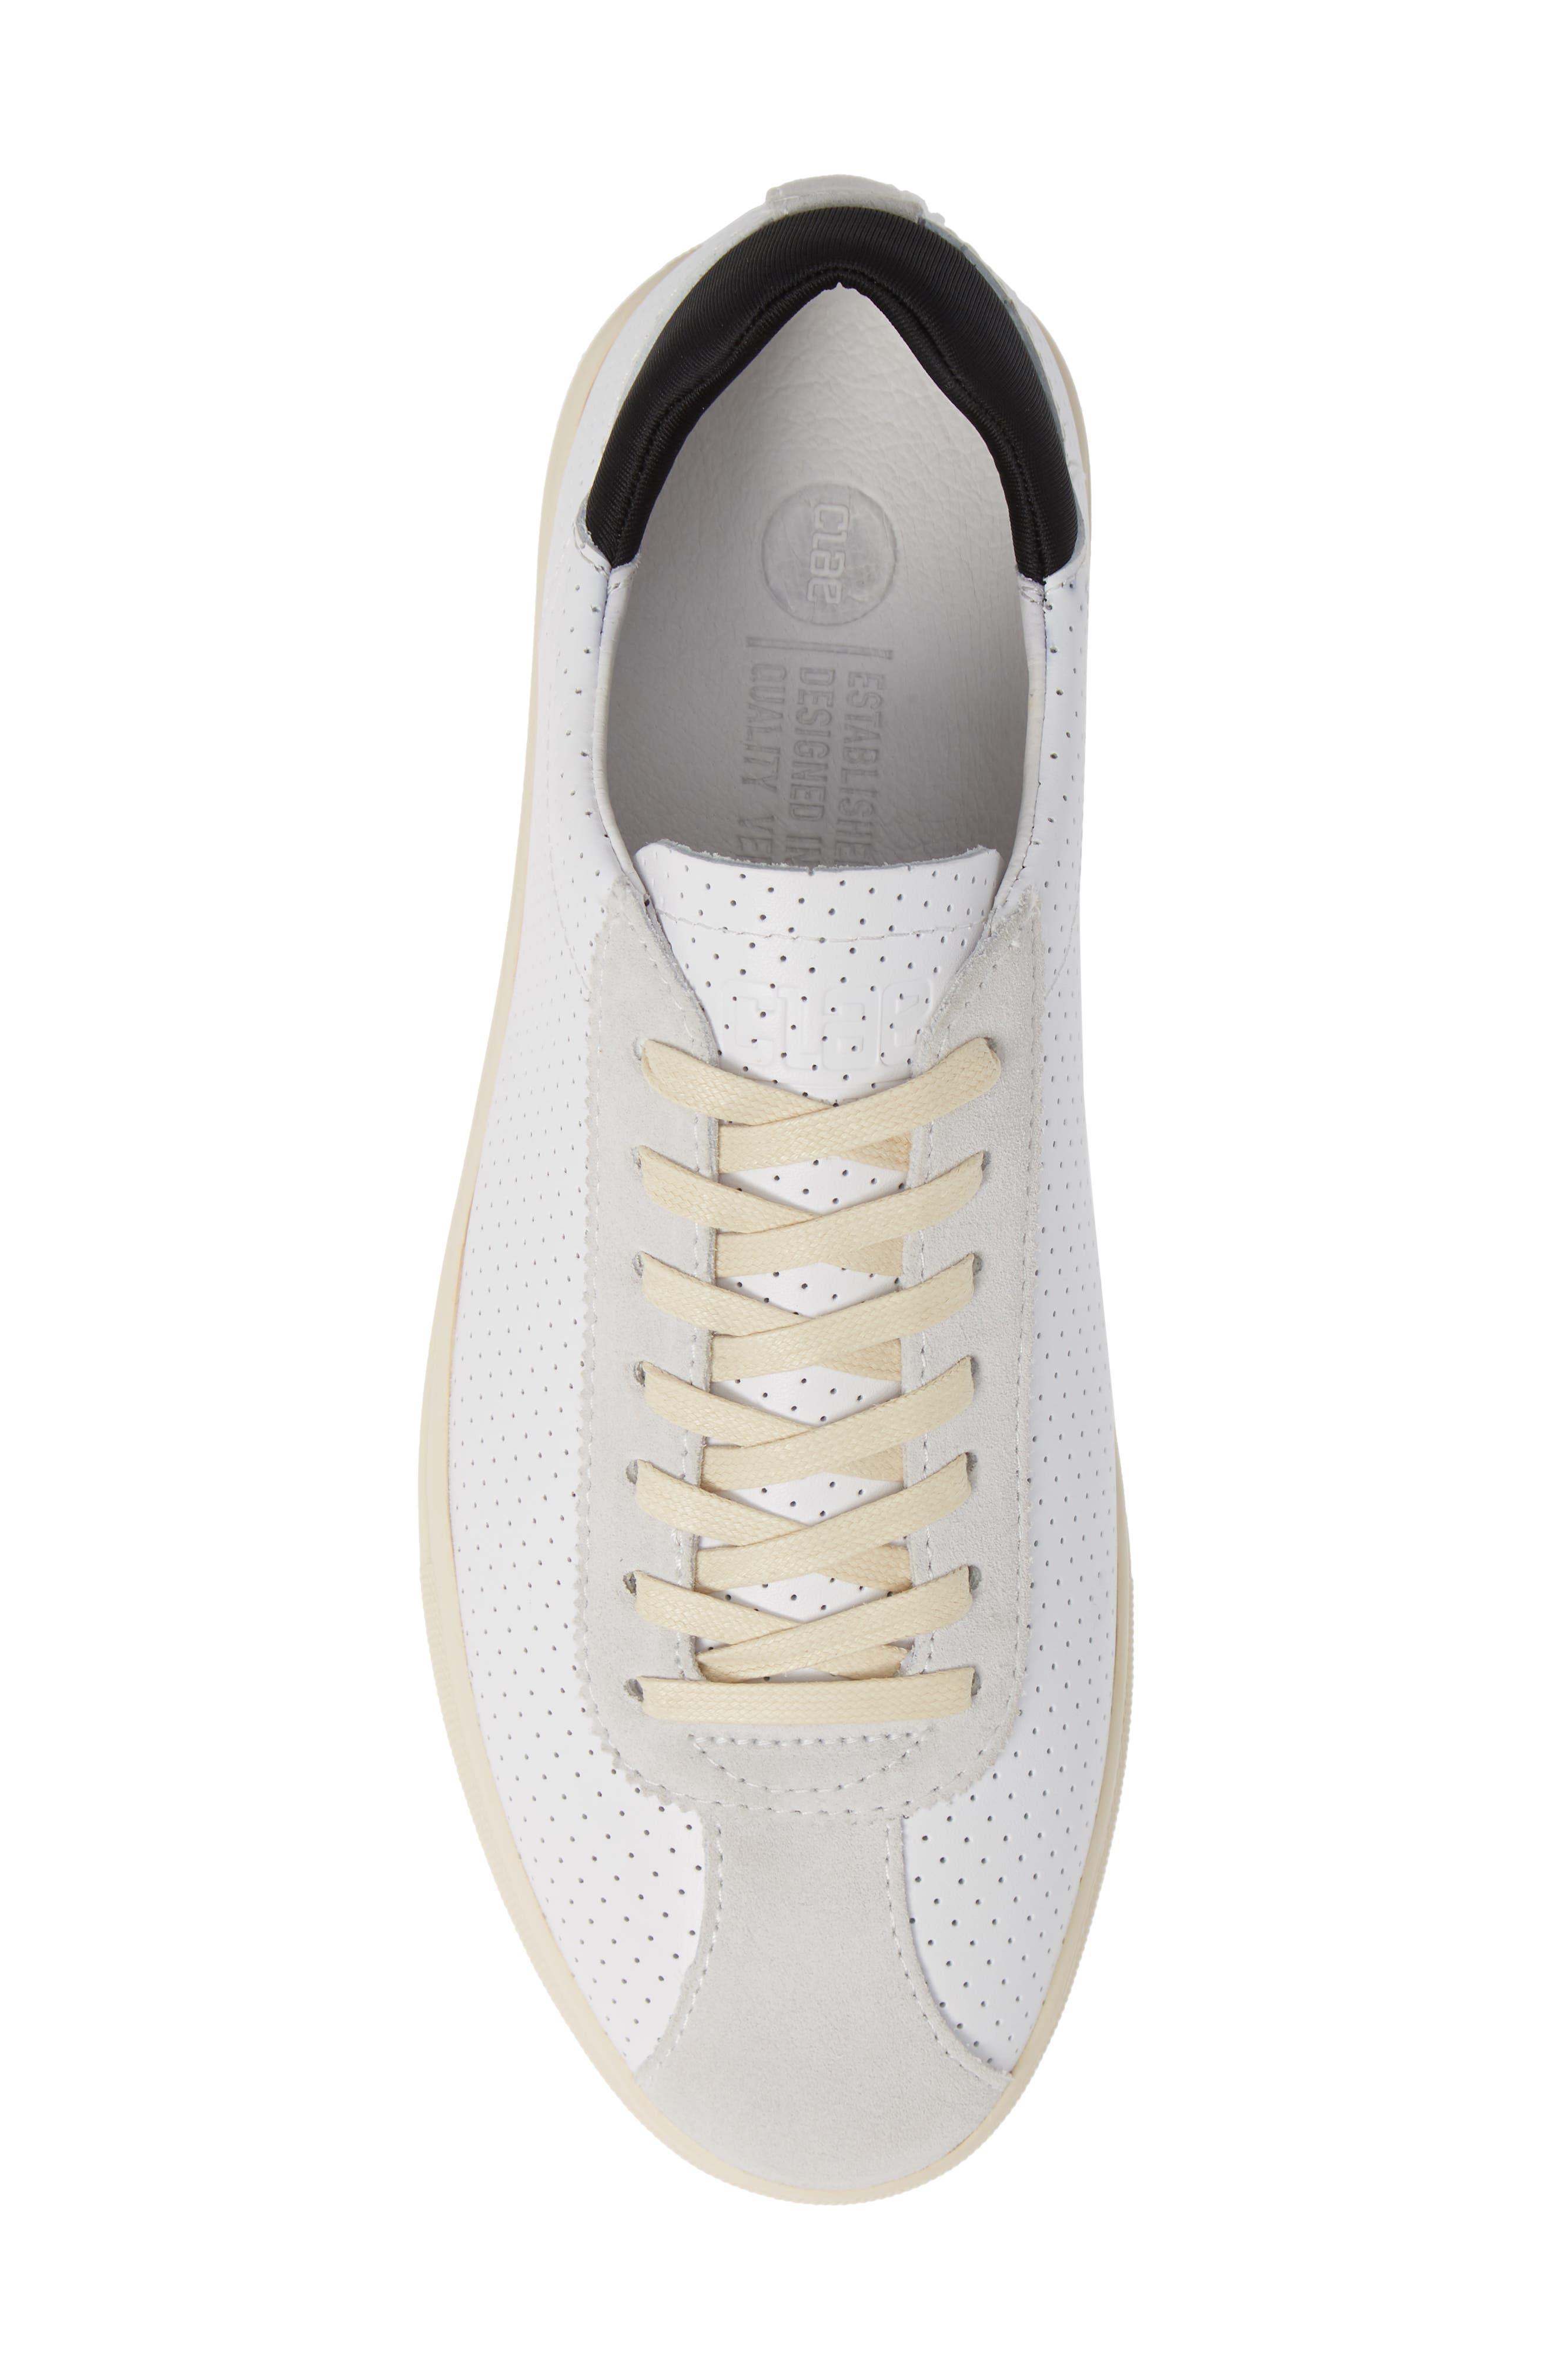 Noah Sneaker,                             Alternate thumbnail 5, color,                             WHITE LEATHER SUEDE CREAM